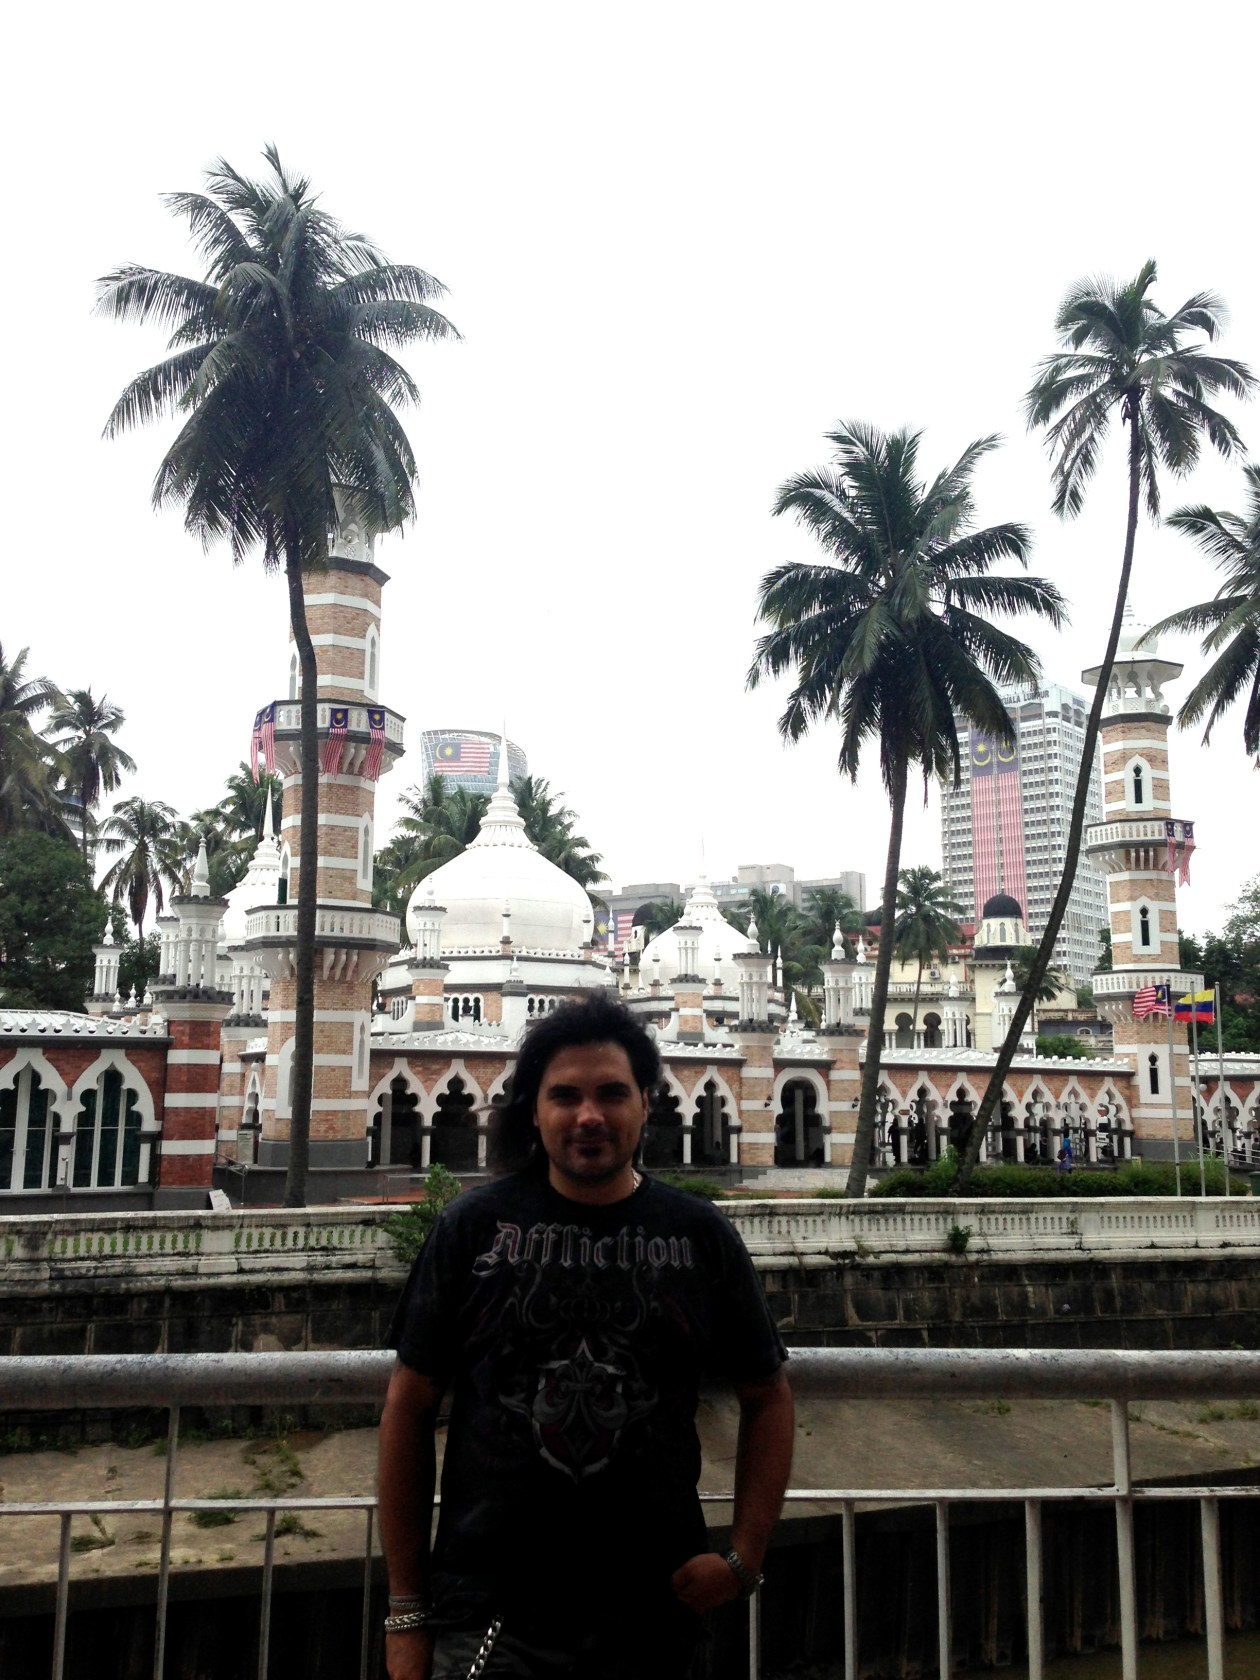 Mezquita Masjid Jamek Kuala Lumpur